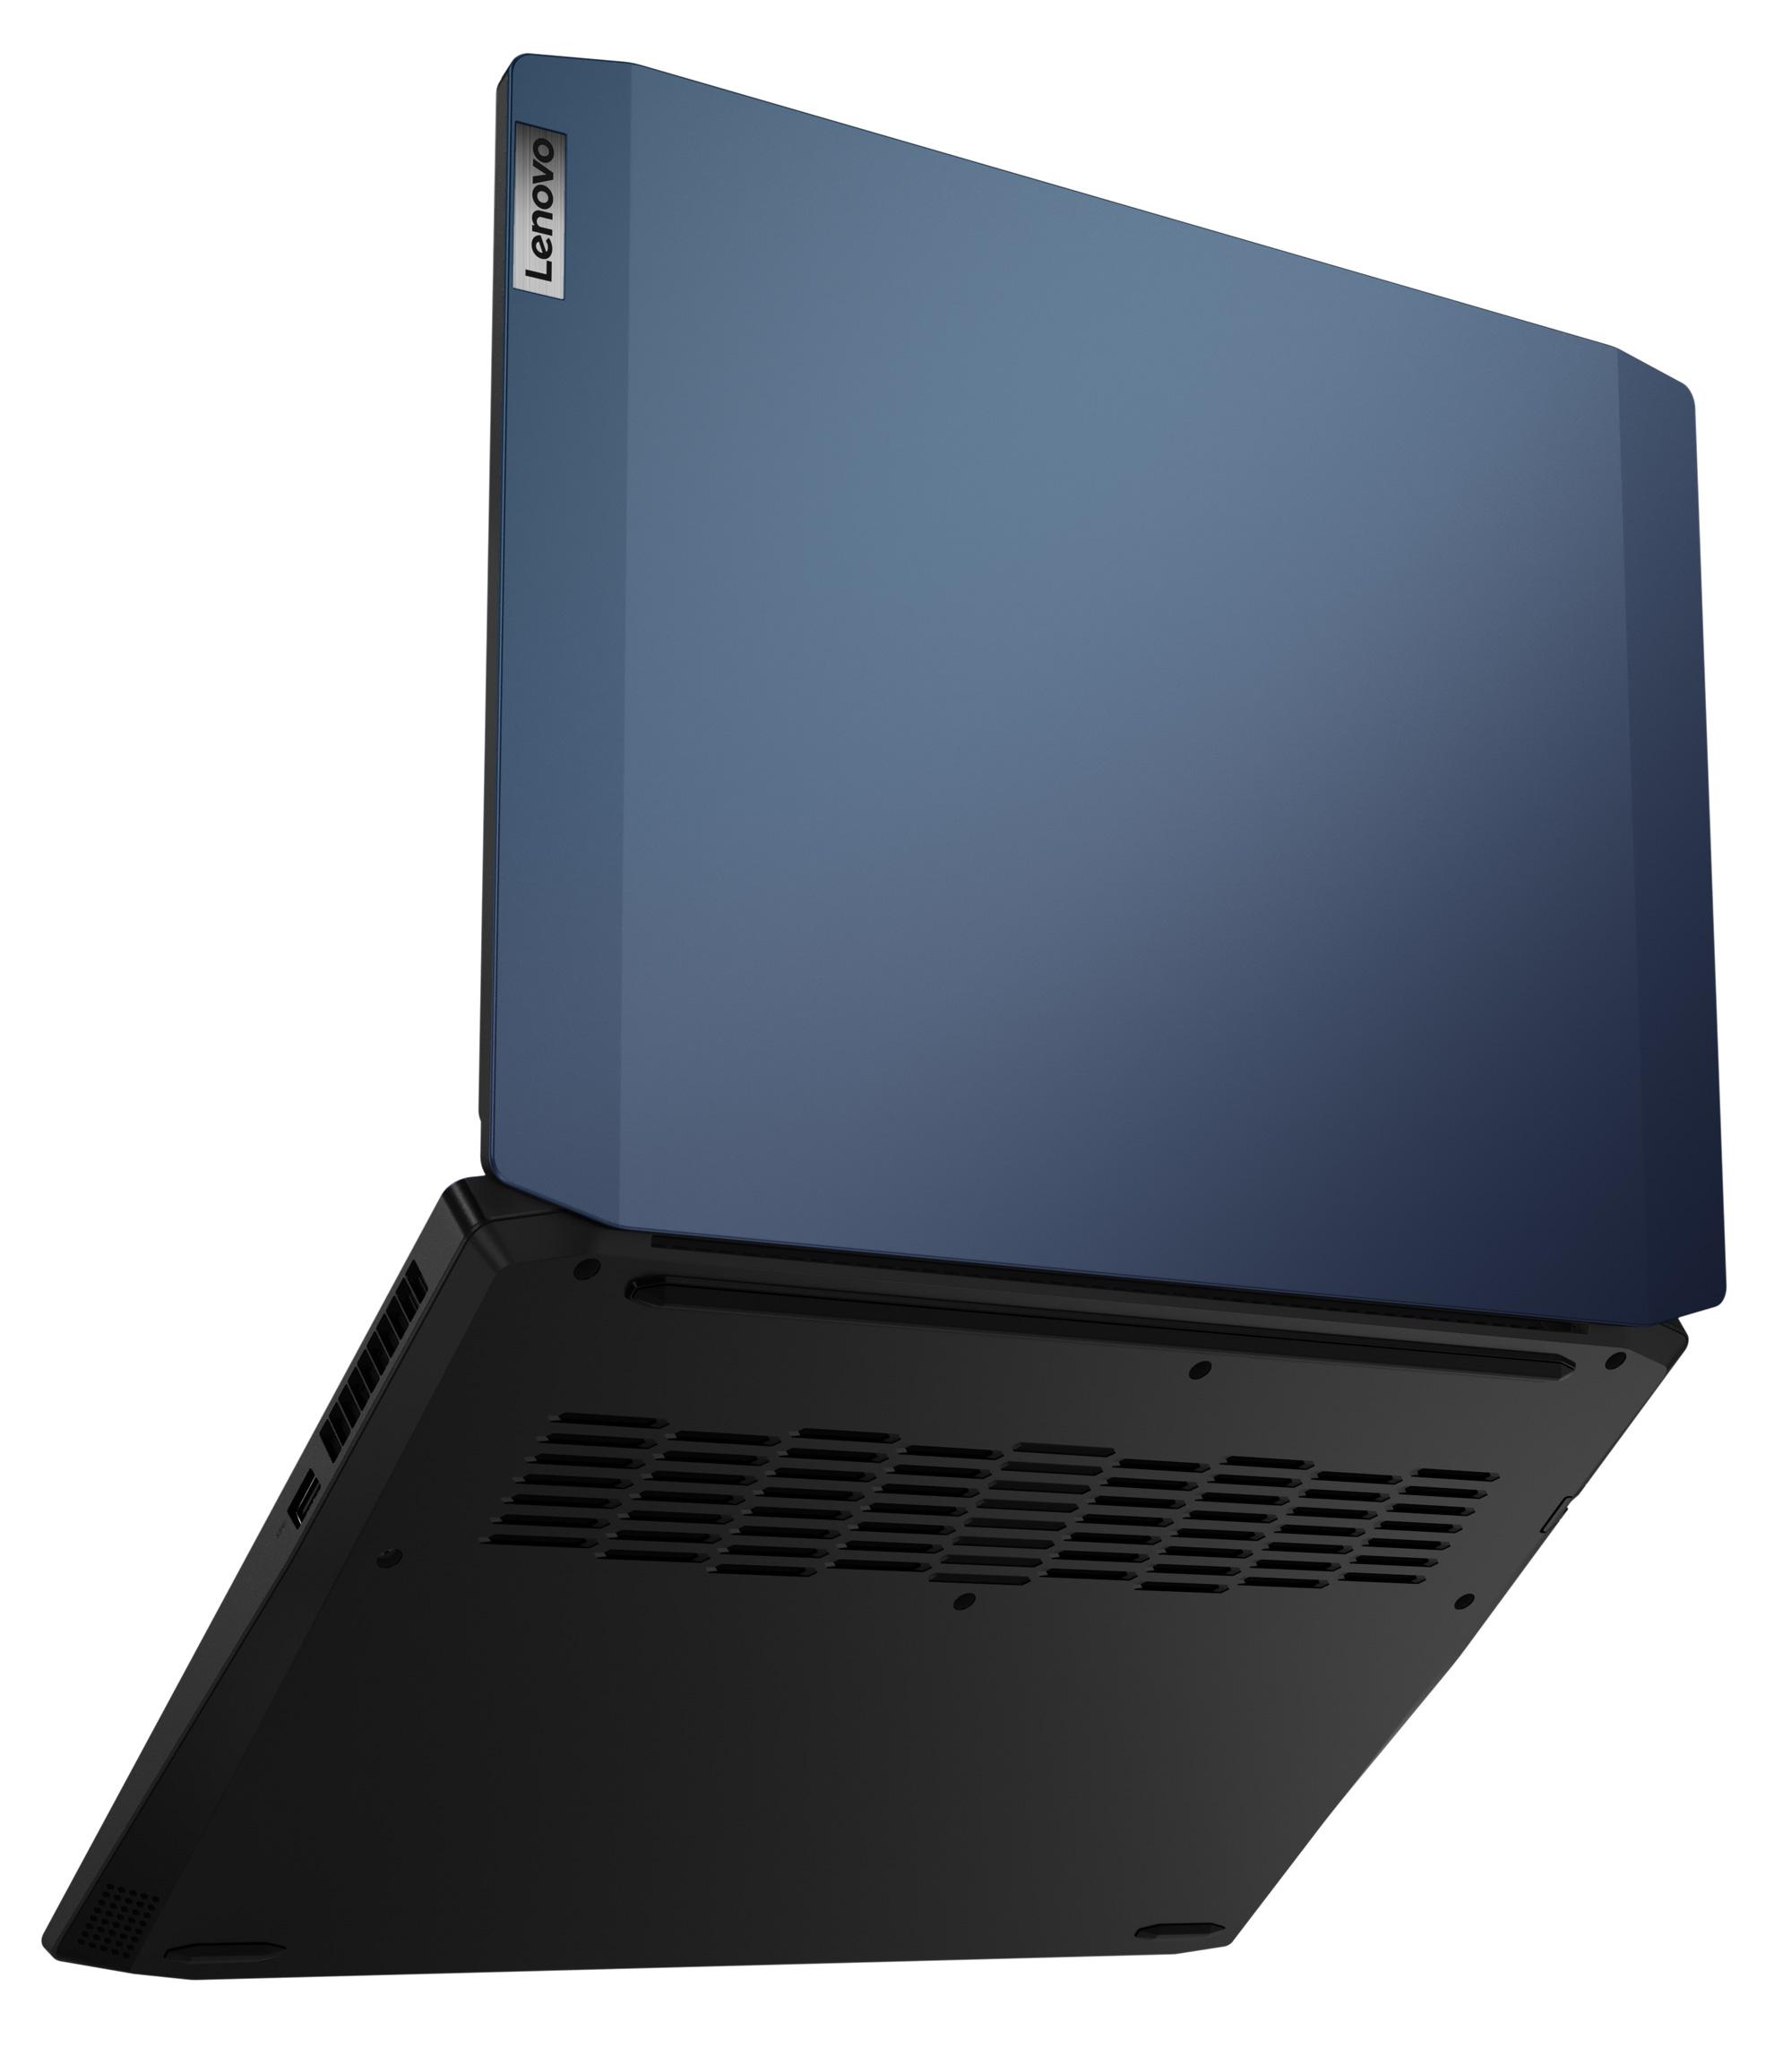 Фото  Ноутбук Lenovo ideapad Gaming 3i 15IMH05 Chameleon Blue (81Y400CGRE)